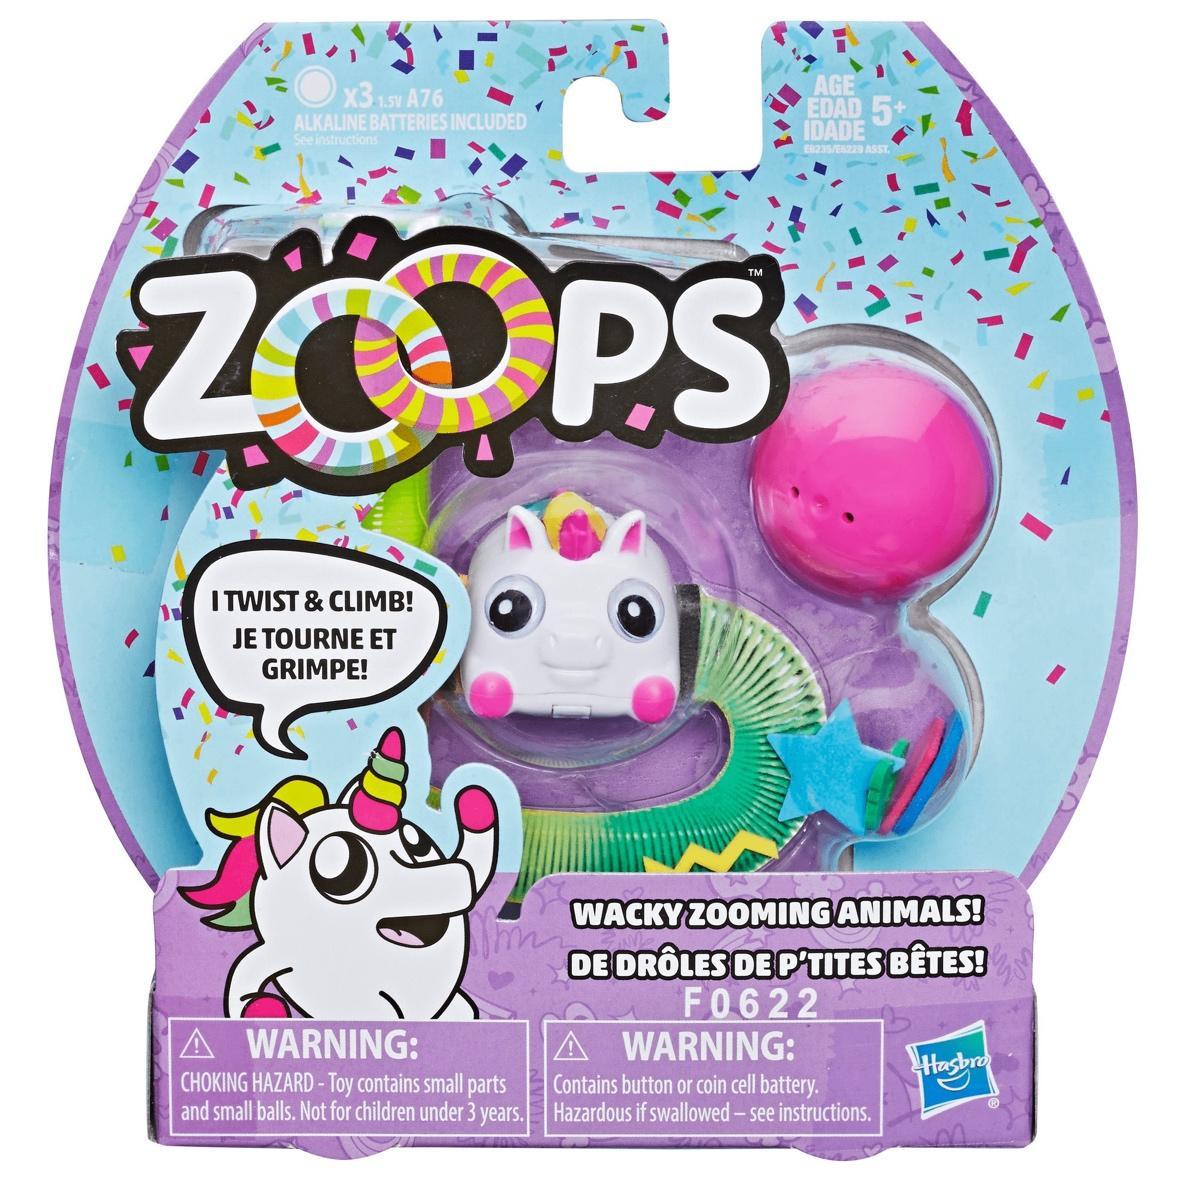 Zoops Electronic Twisting Zooming Climbing Toy Rainbow Unicorn Pet